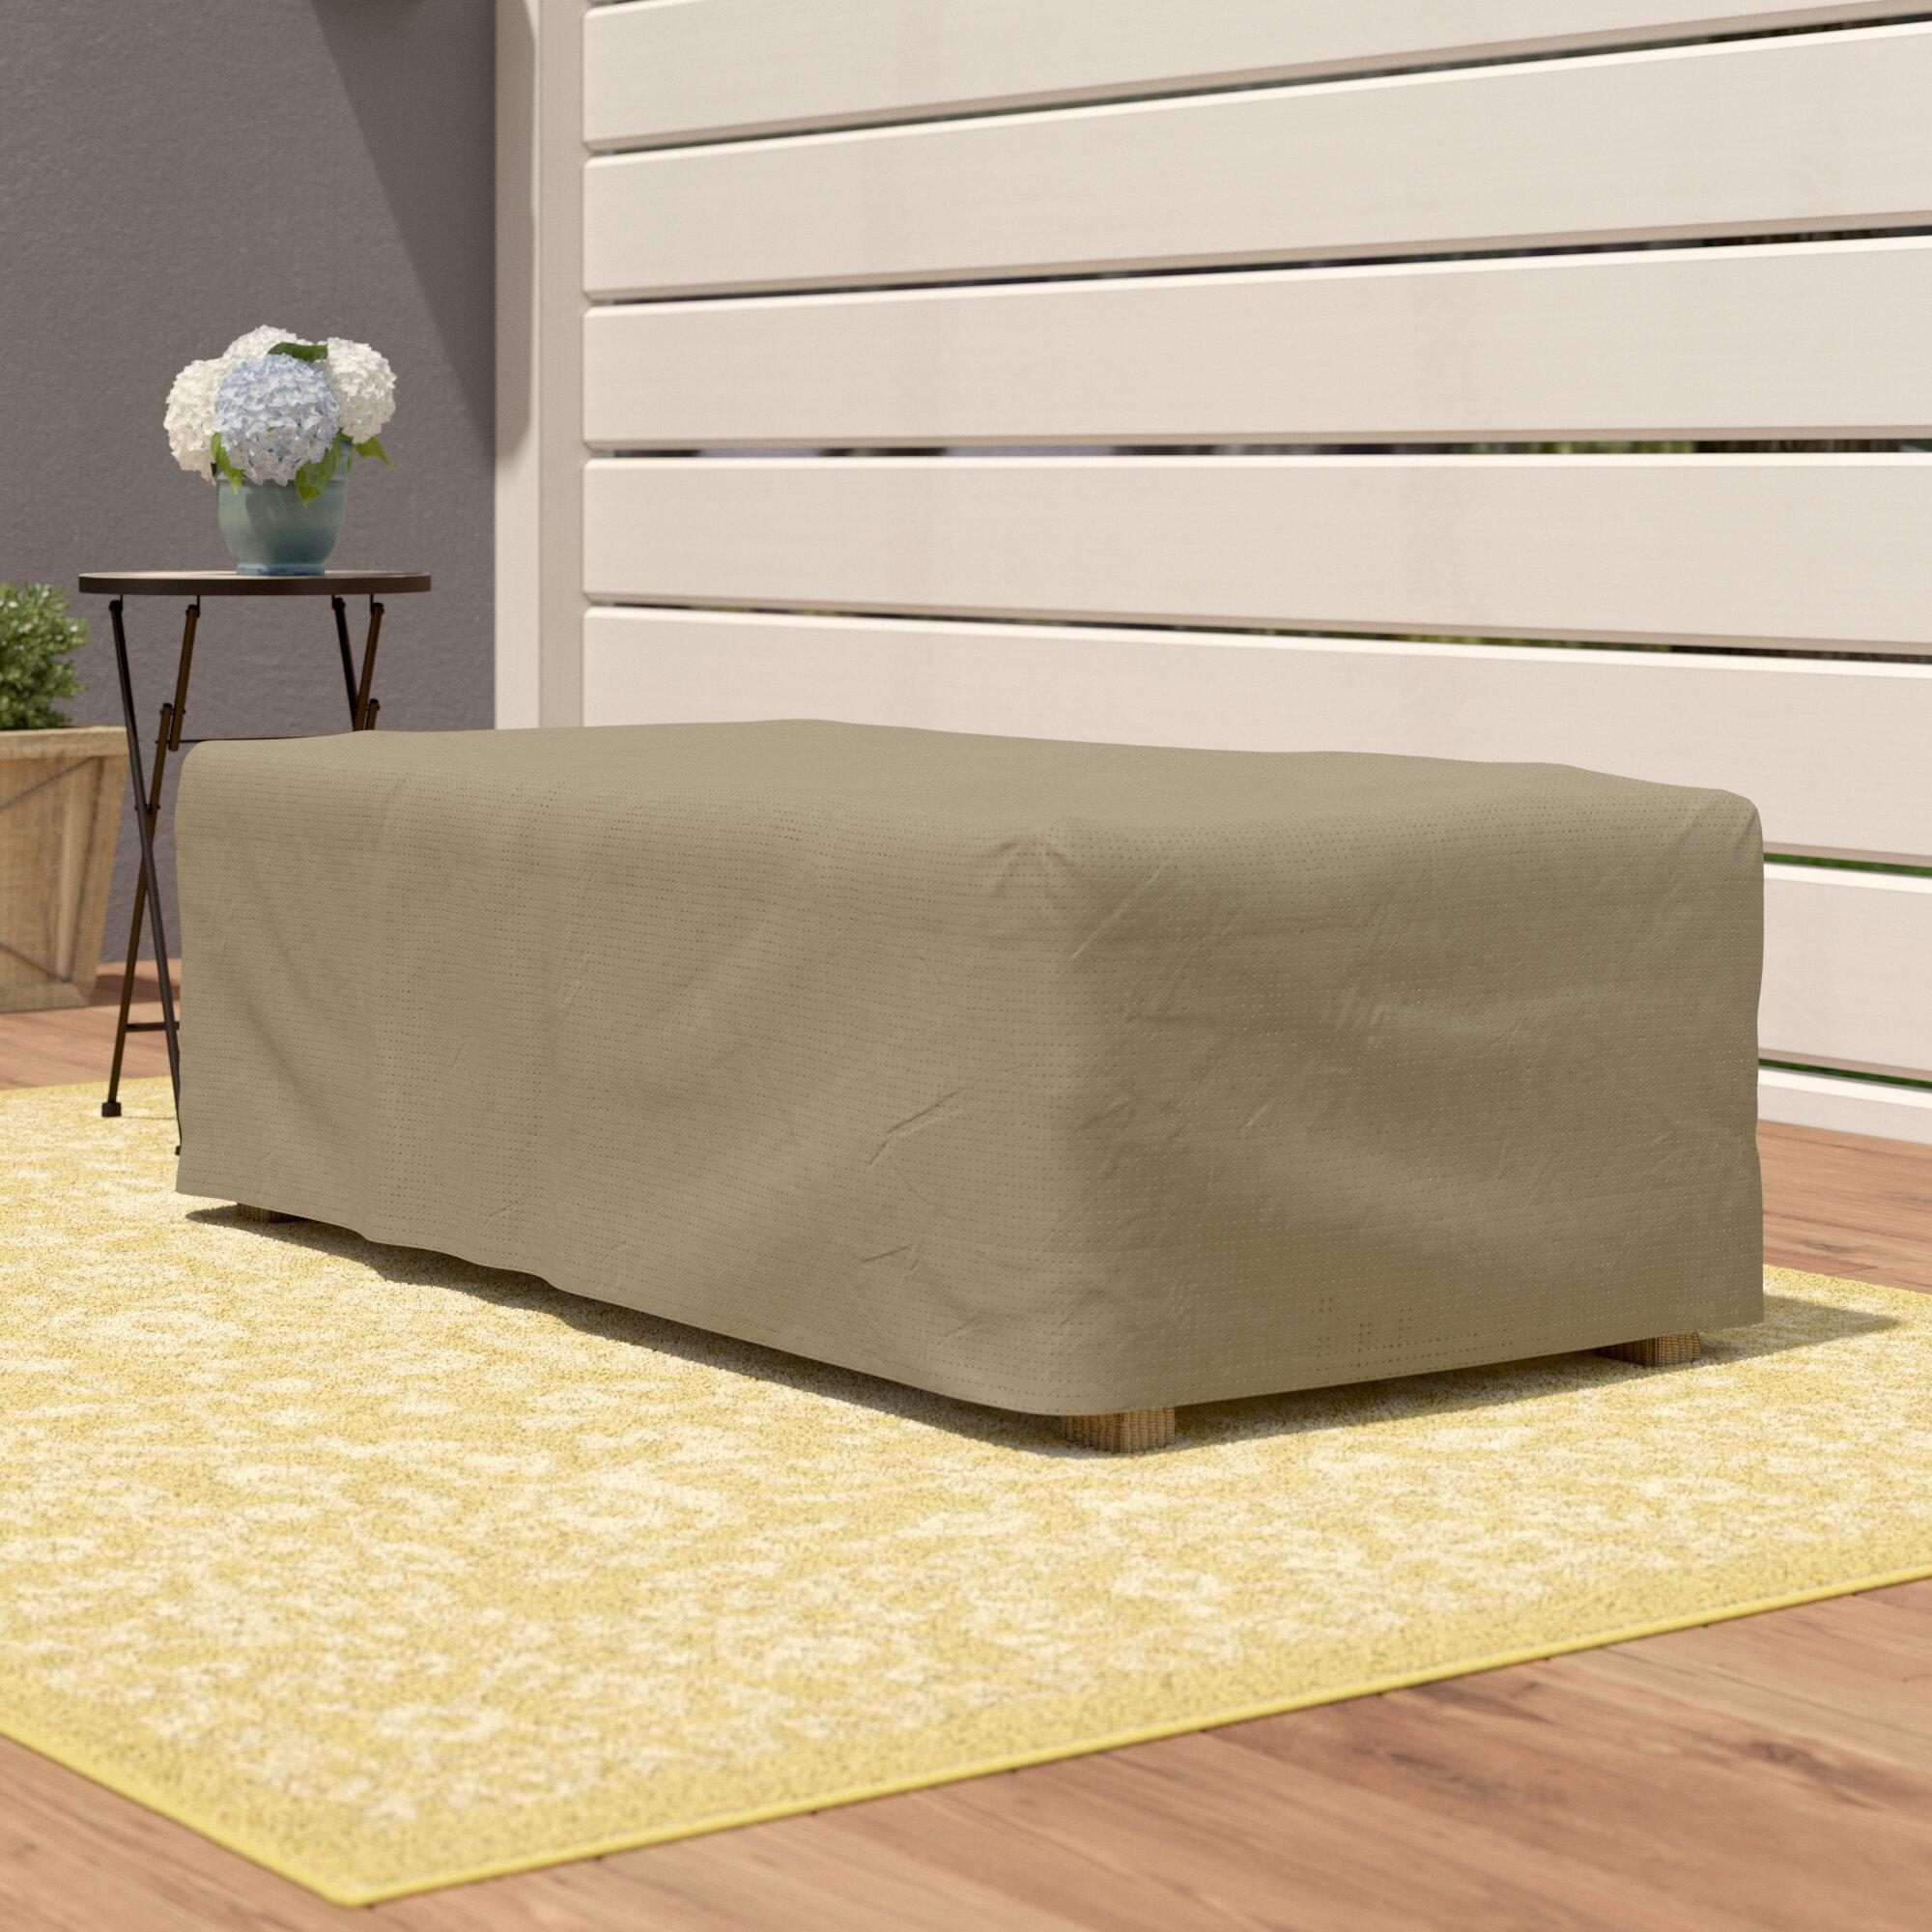 Wayfair basics rectangle patio ottoman or side table cover reviews birch lane